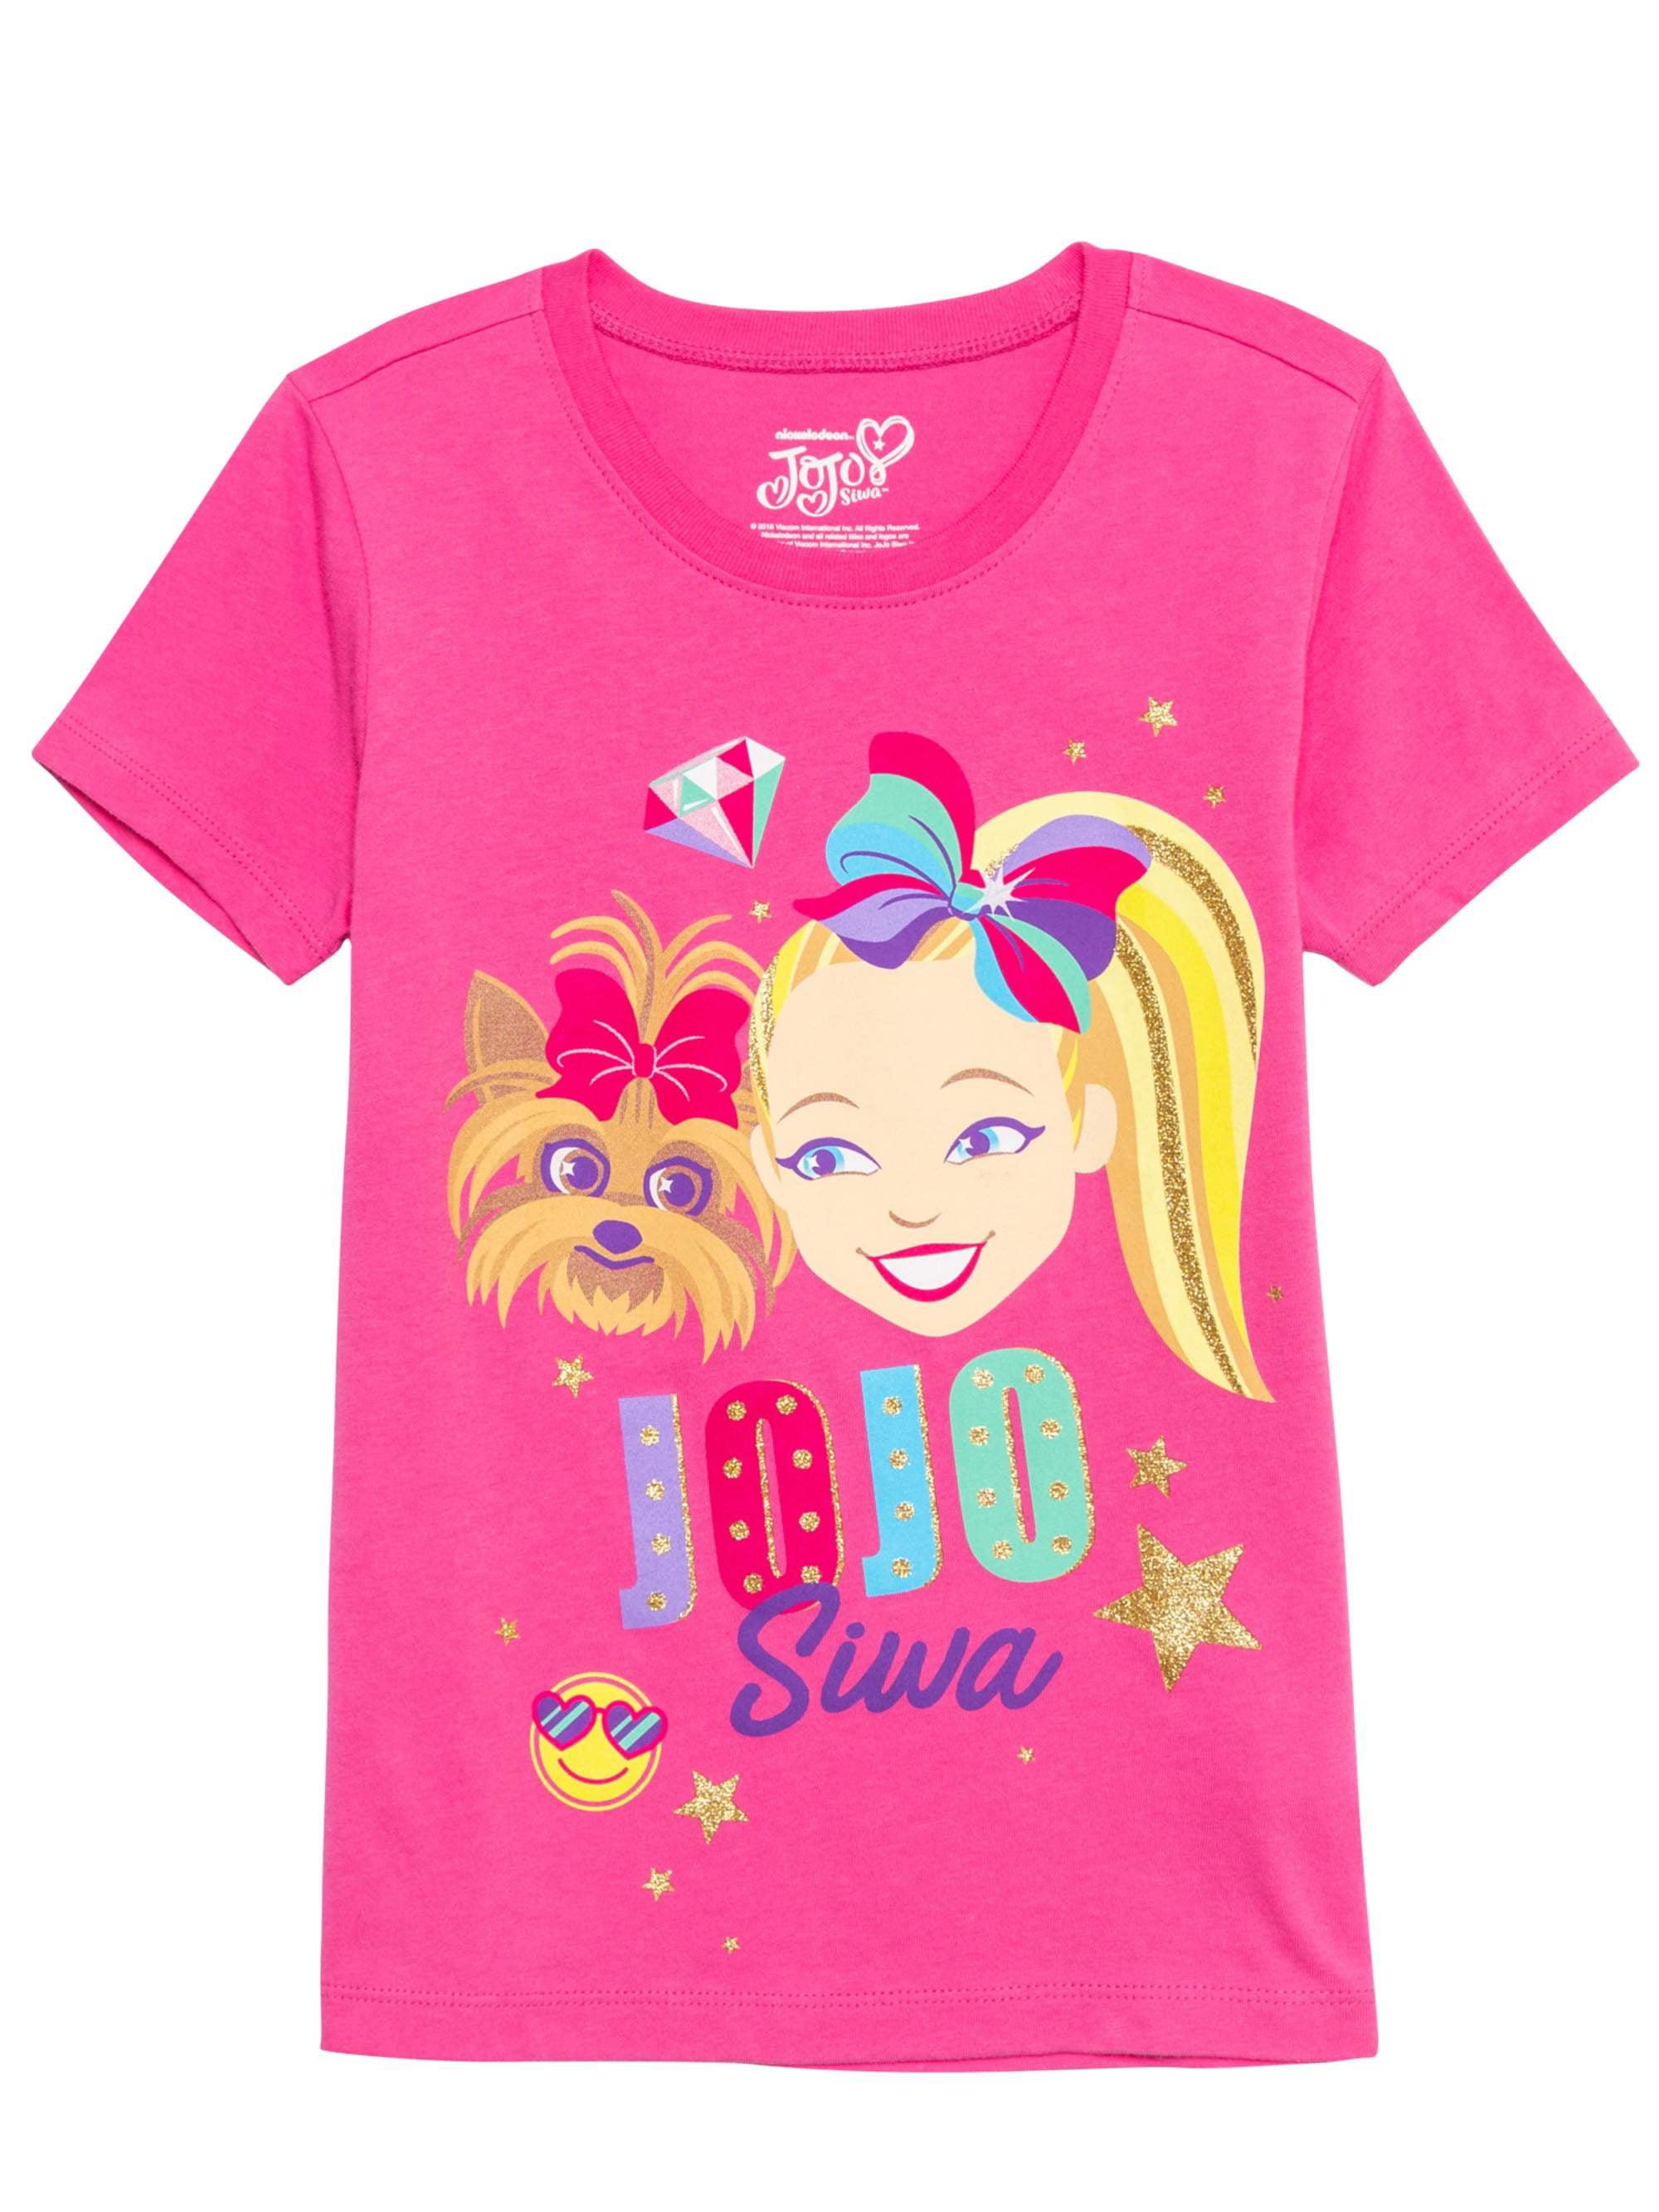 Nickelodeon Jojo Siwa Girls Turquoise Blue Short Sleeve T-shirt Free Ship Small